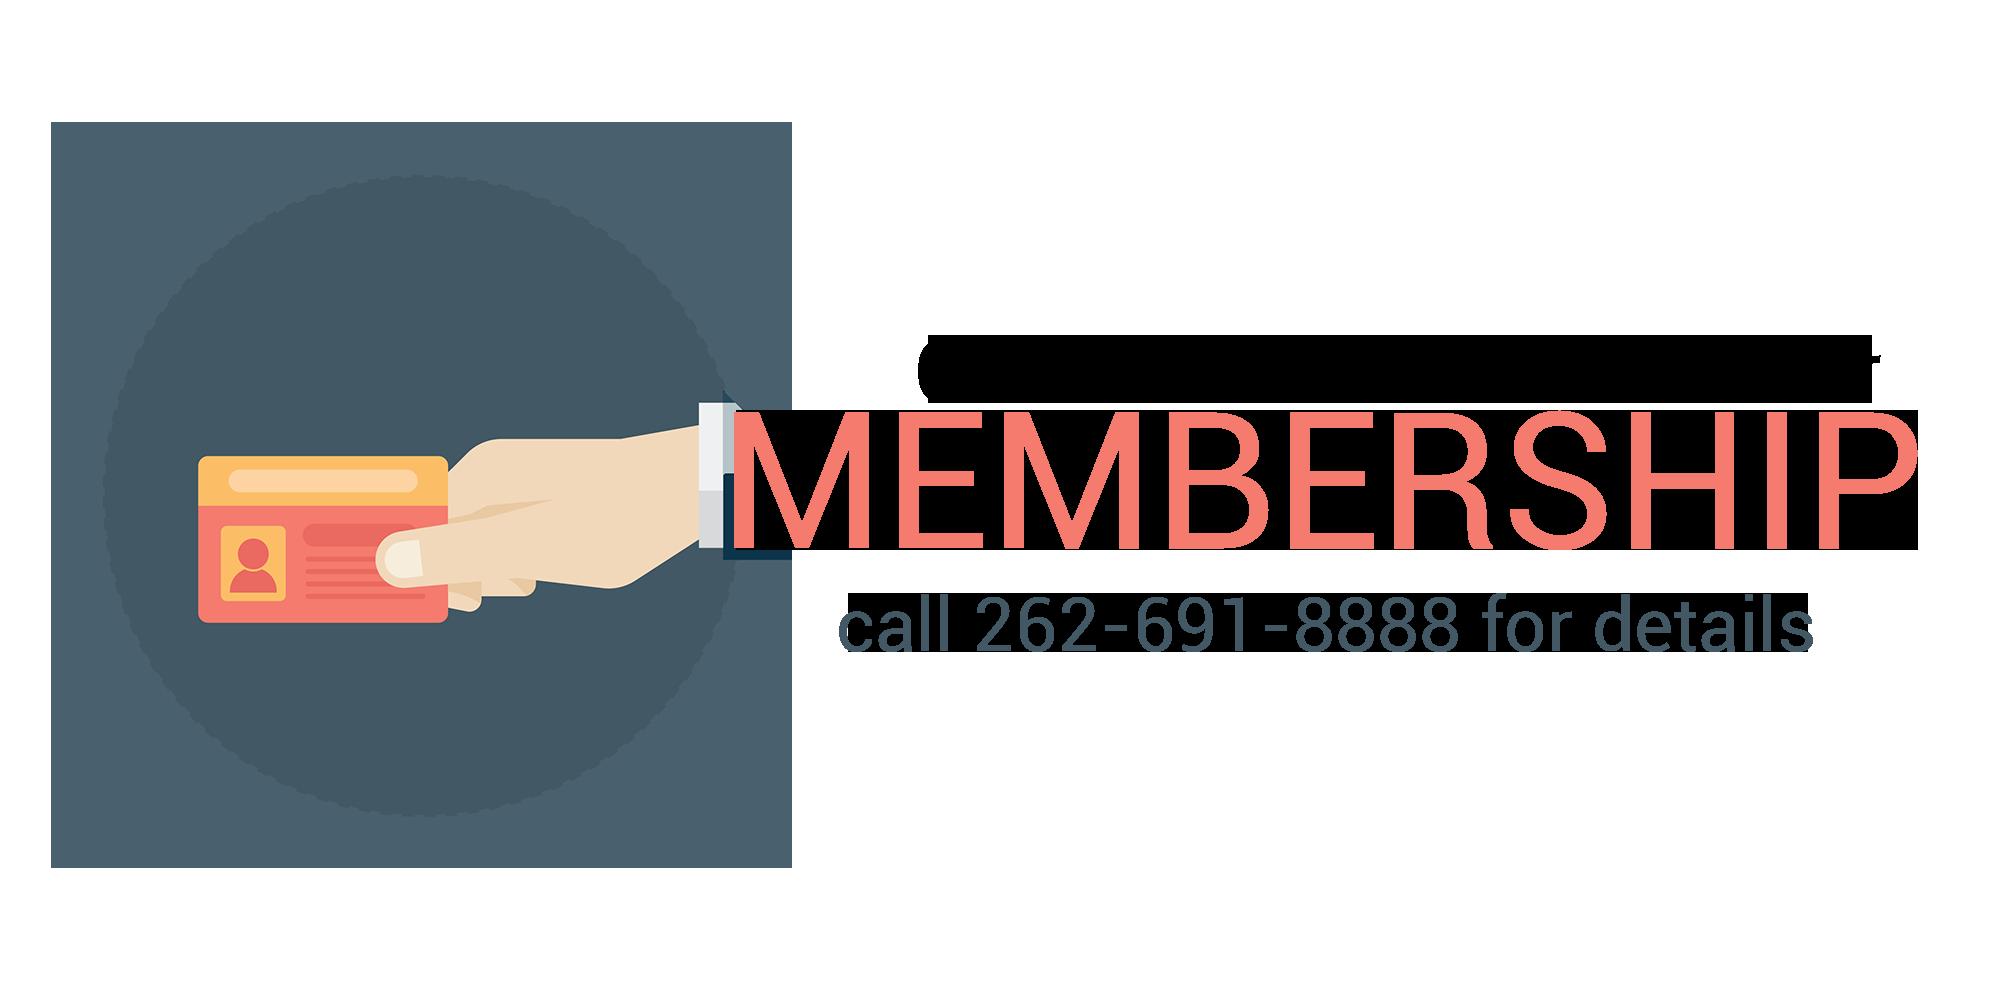 Oriental Wellness Center Membership